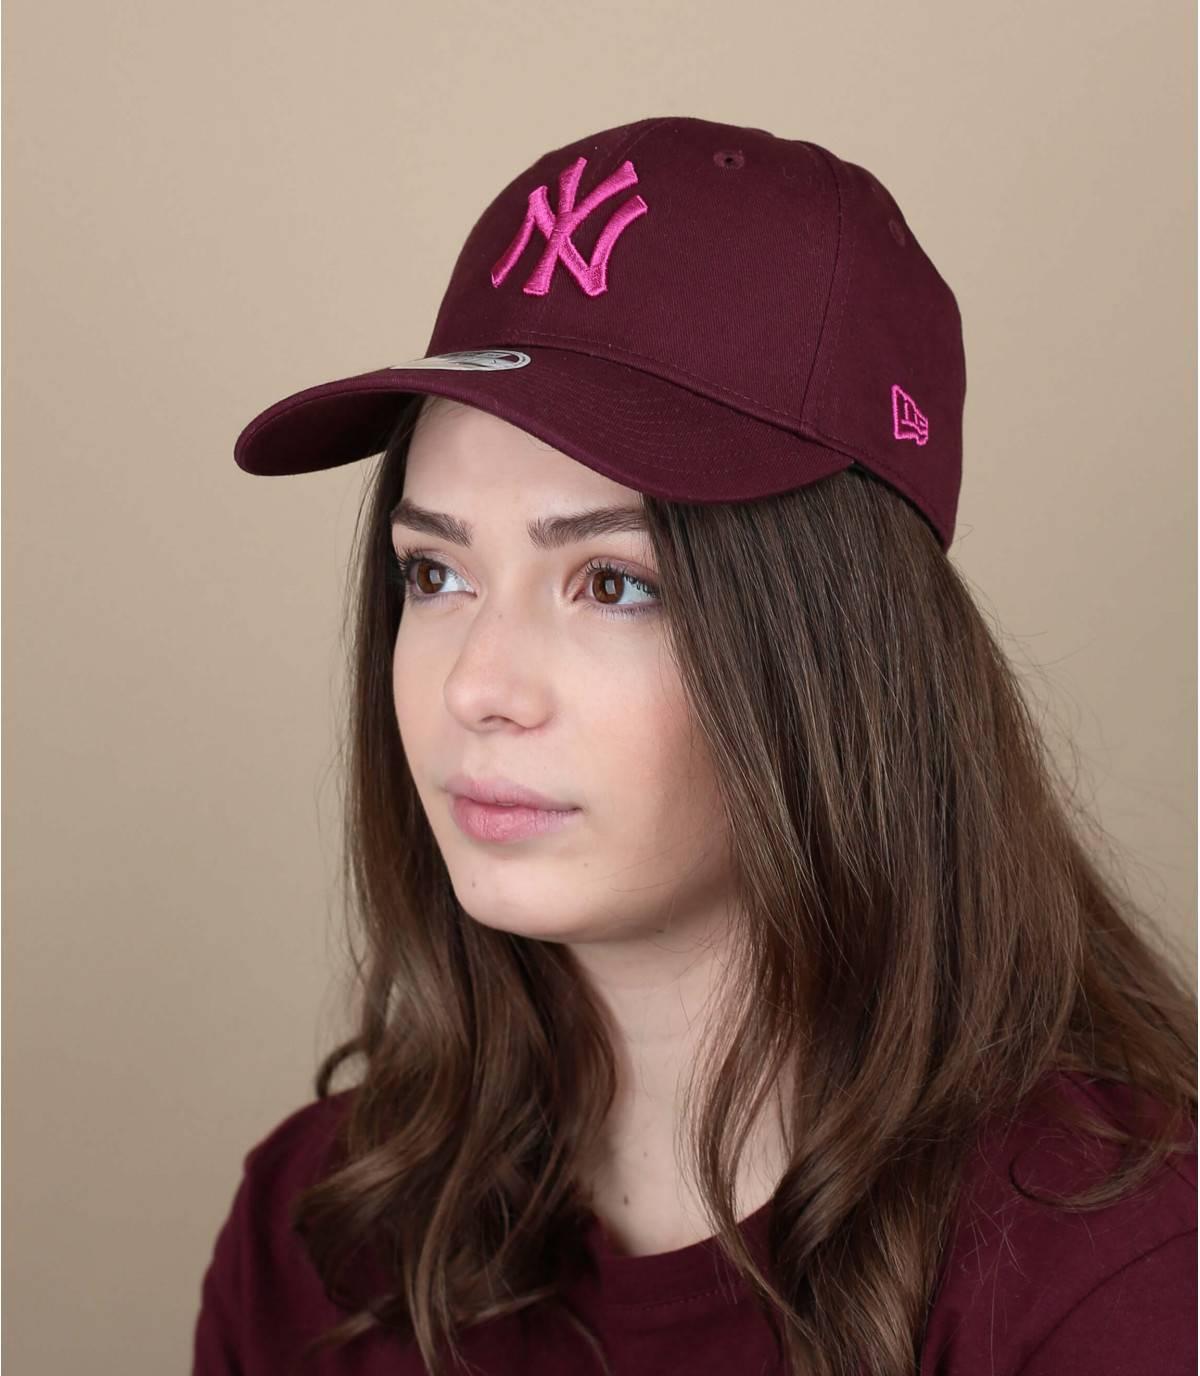 gorra mujer burdeos